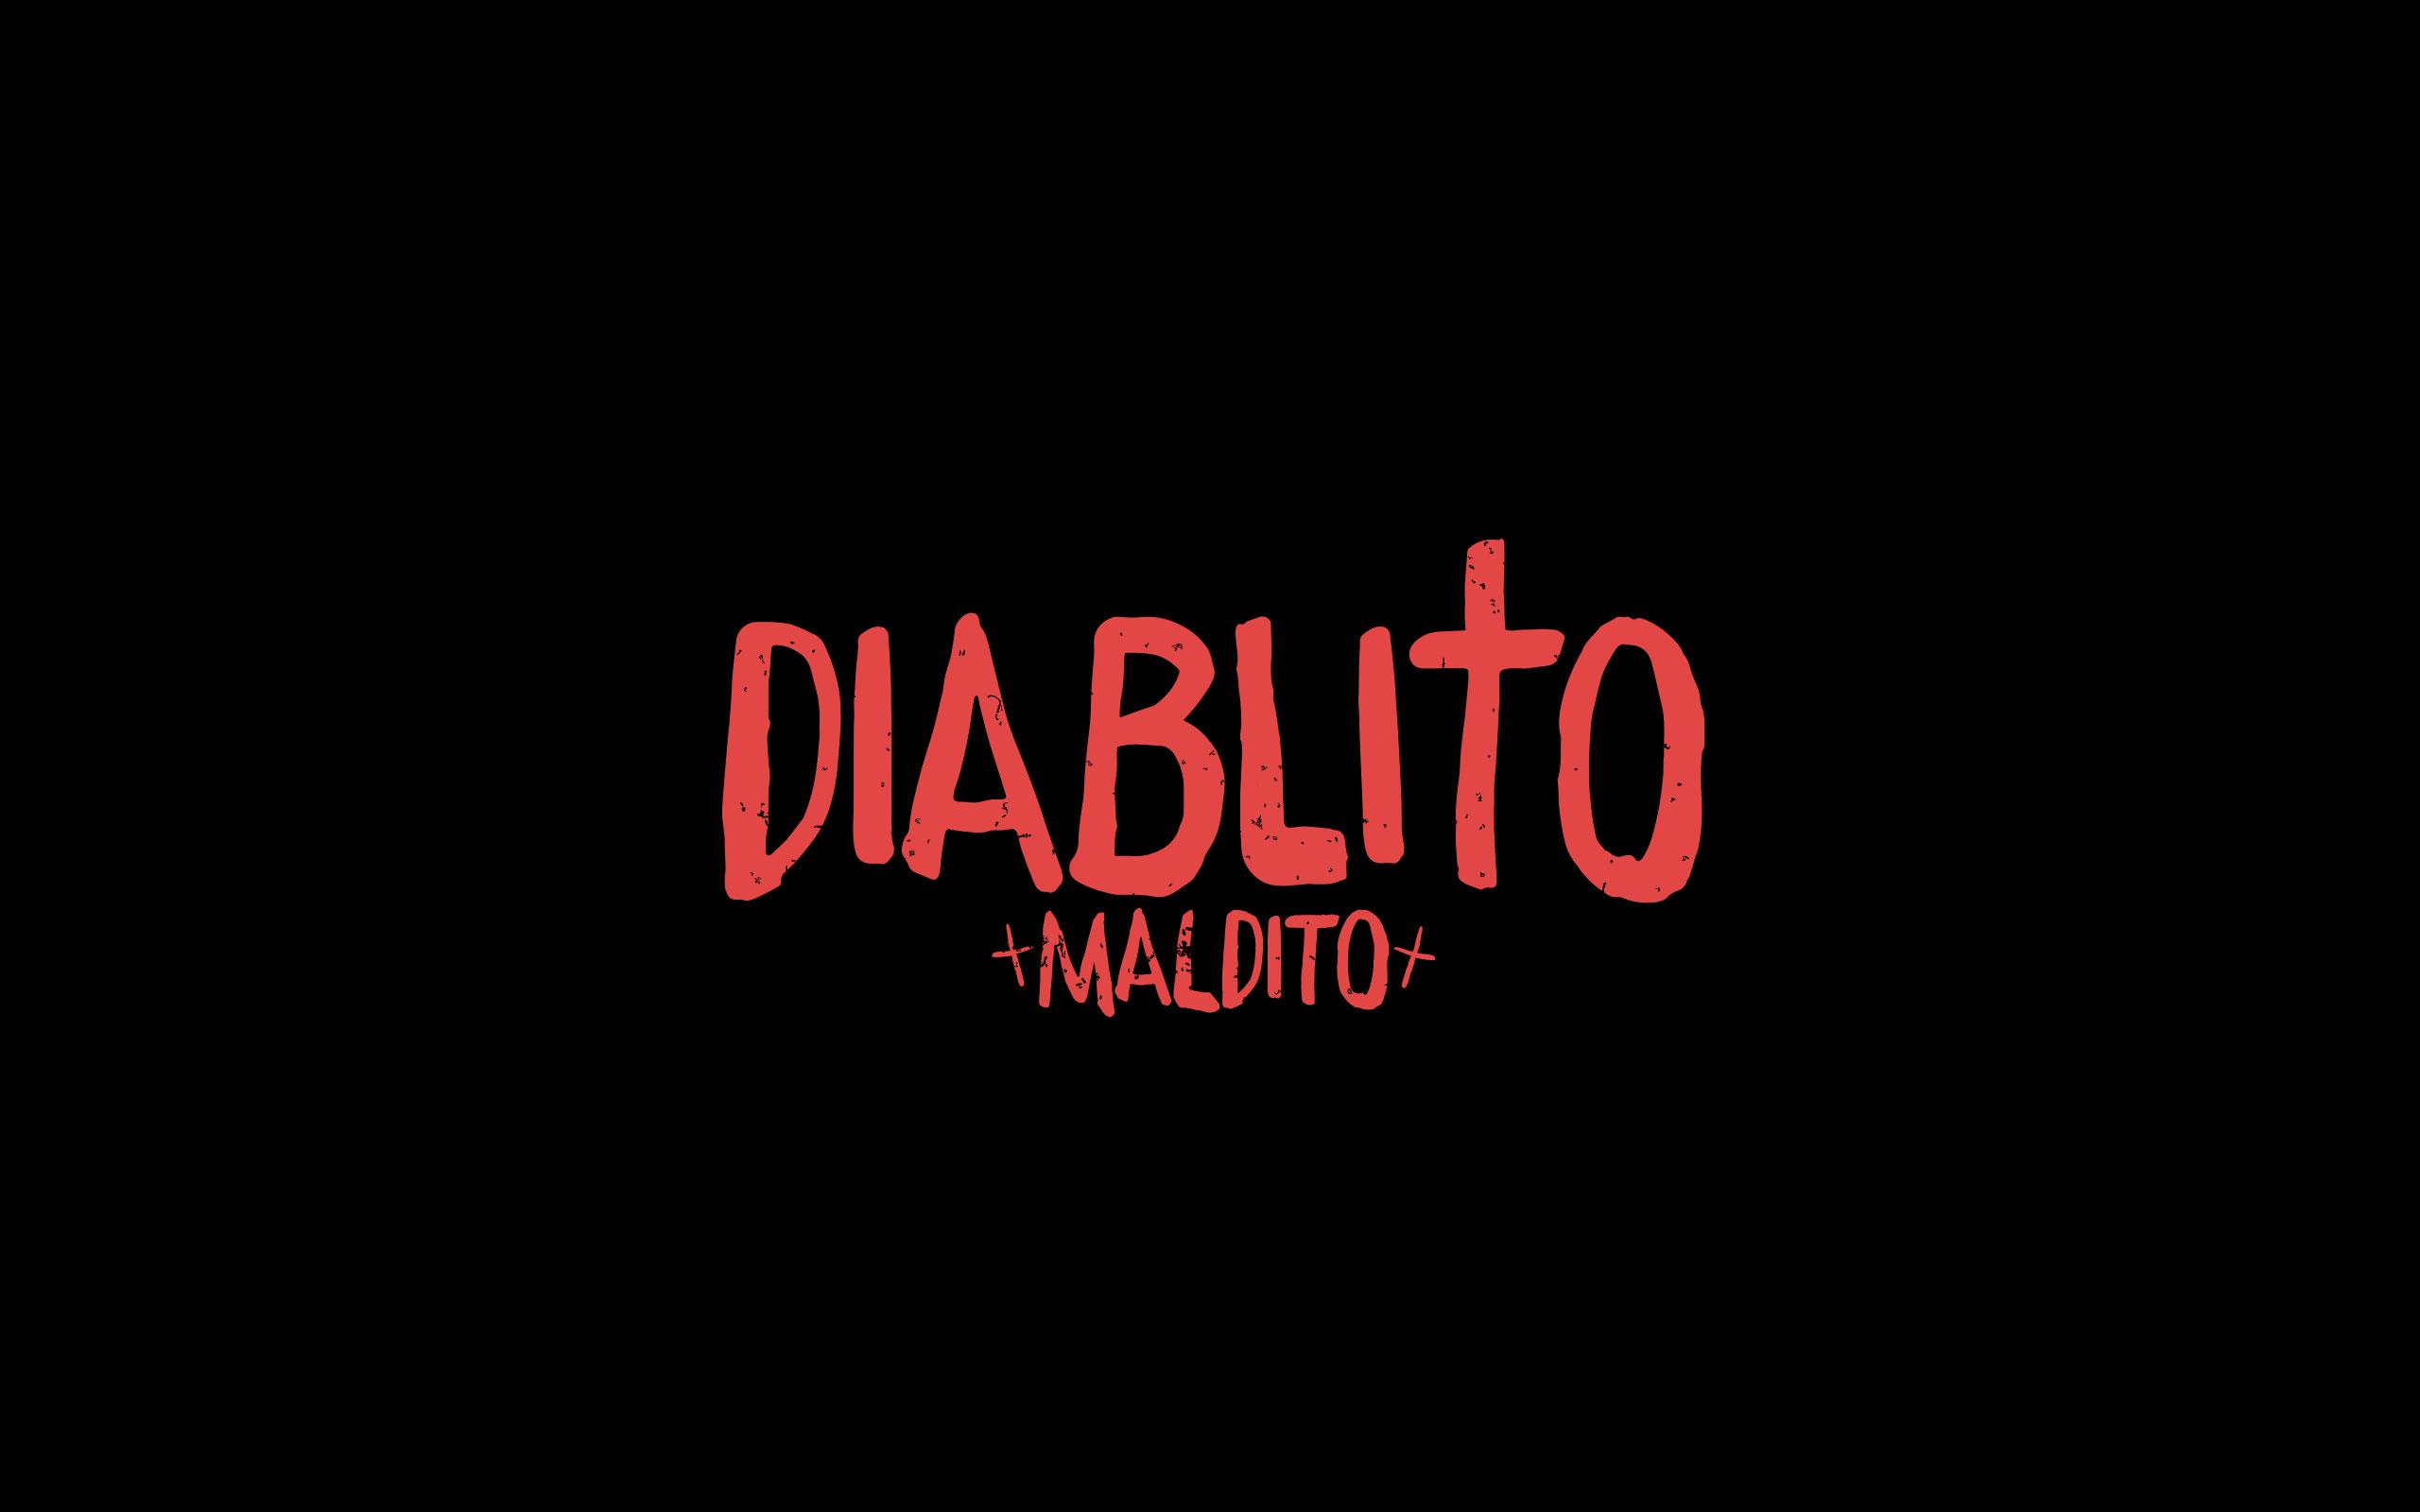 Diablito_011